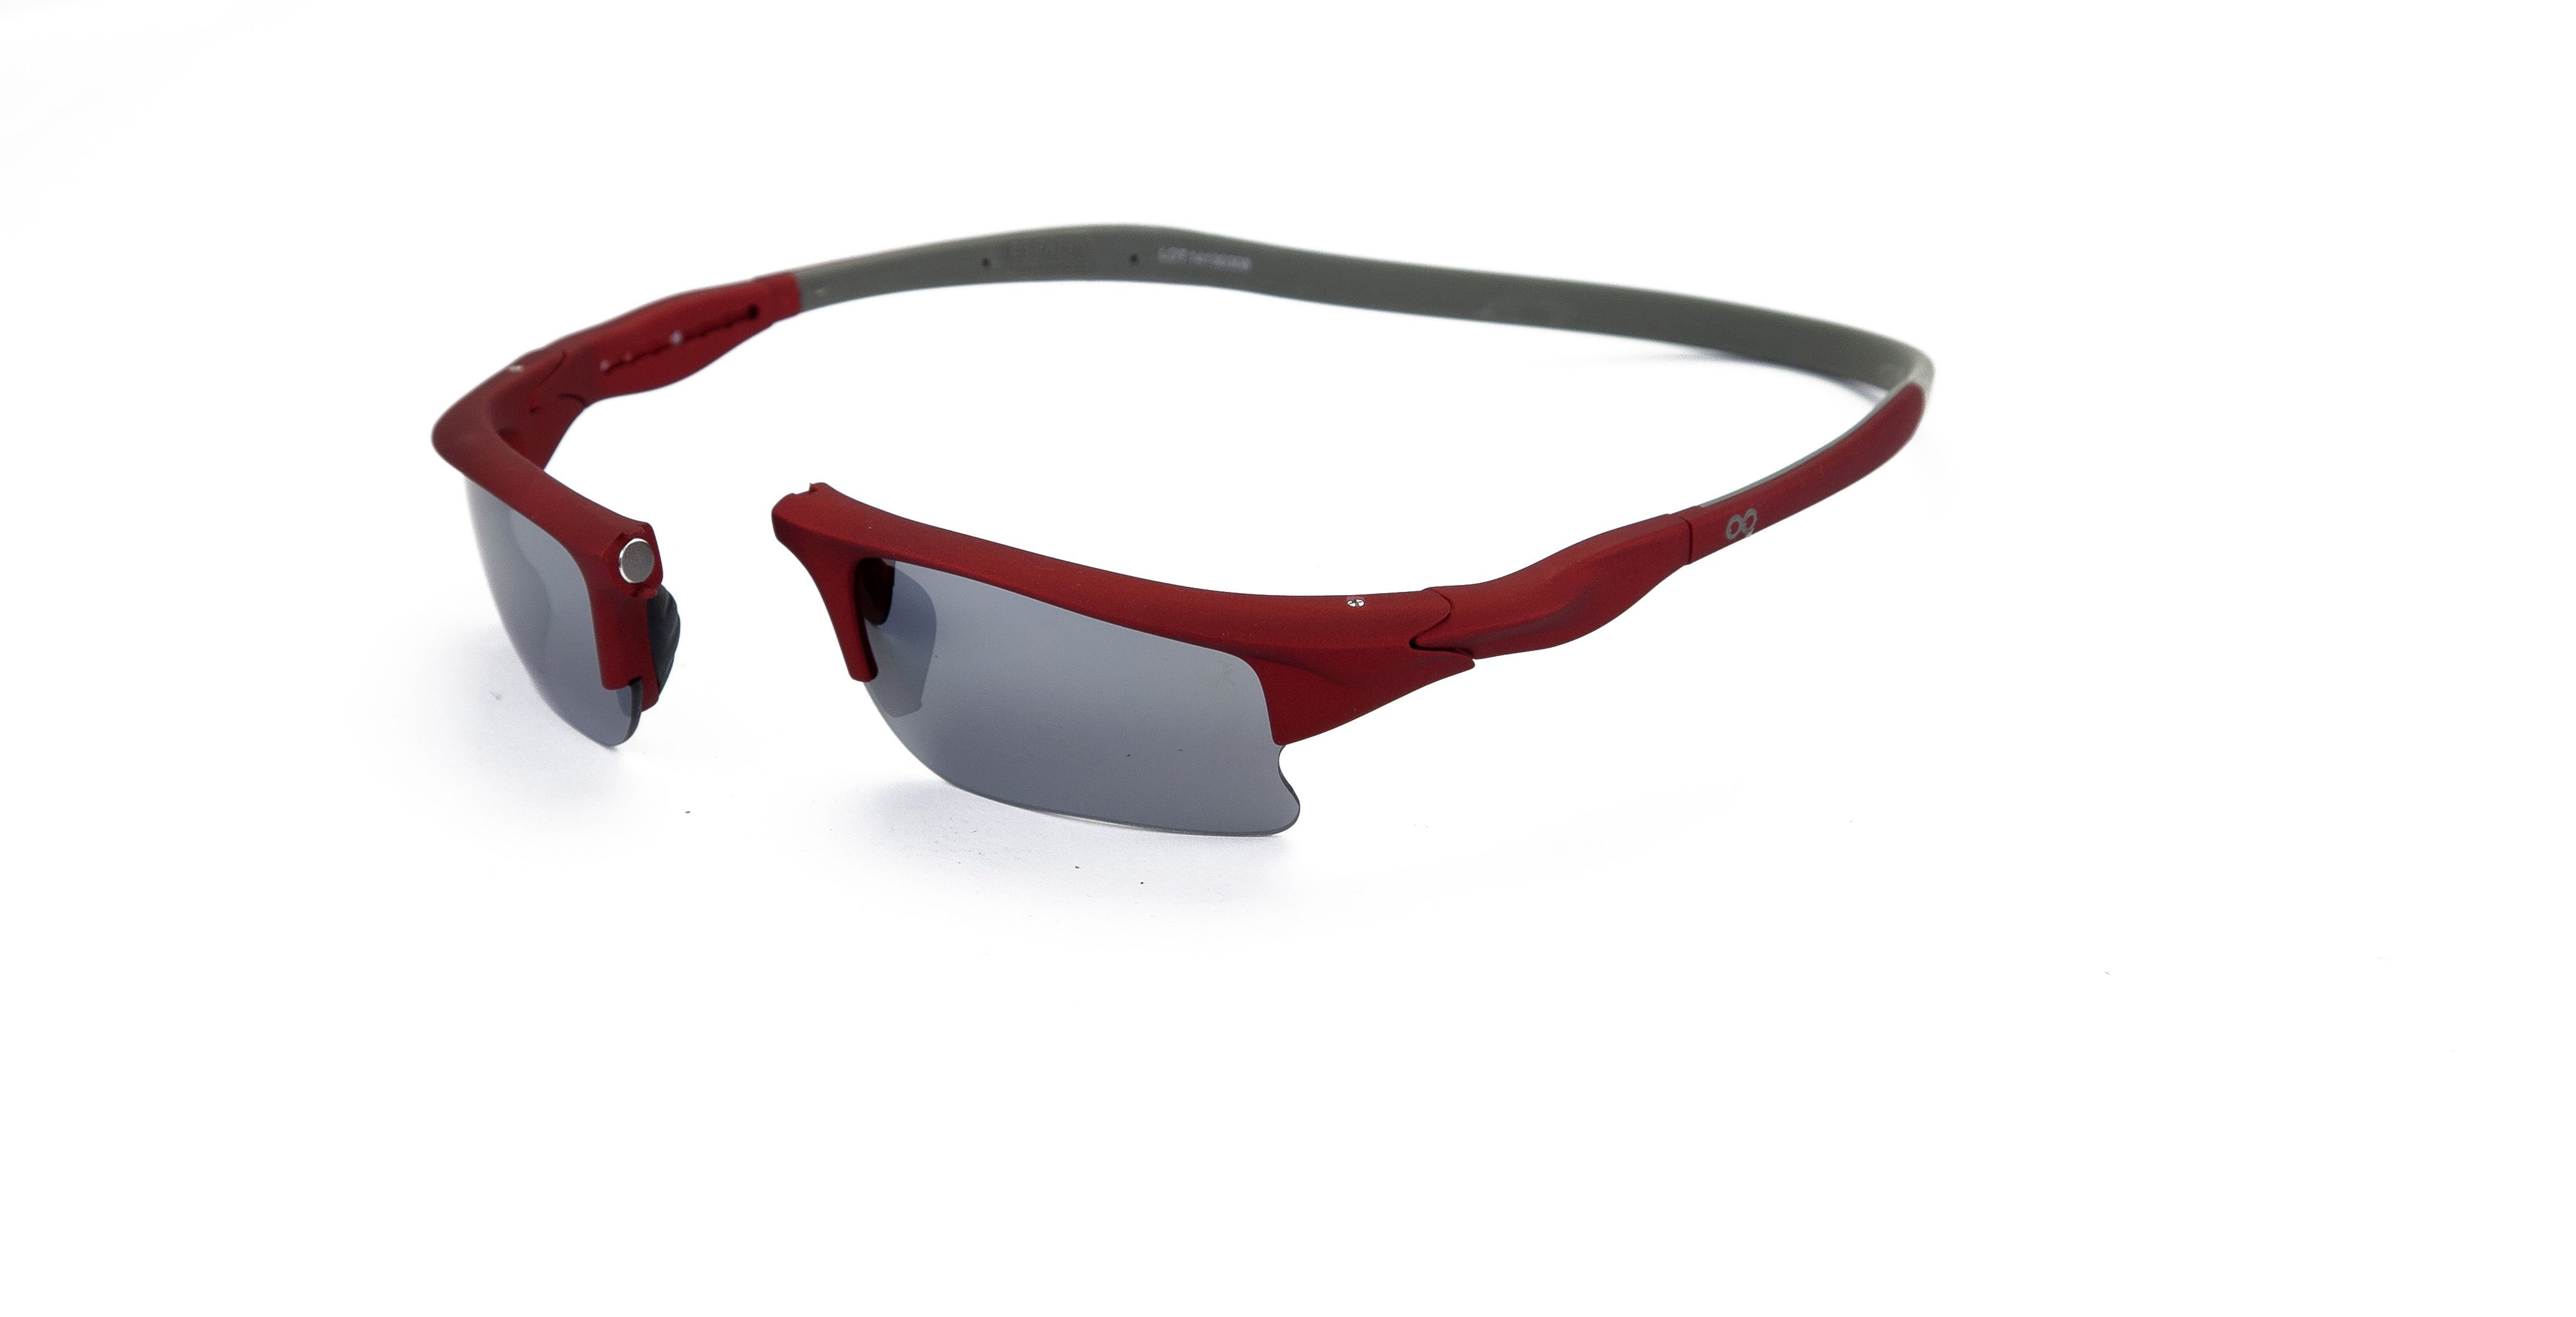 #eyewear #slastik #gafadesol #sport #magnetic #polarizado #policarbonato #clic #barcelona